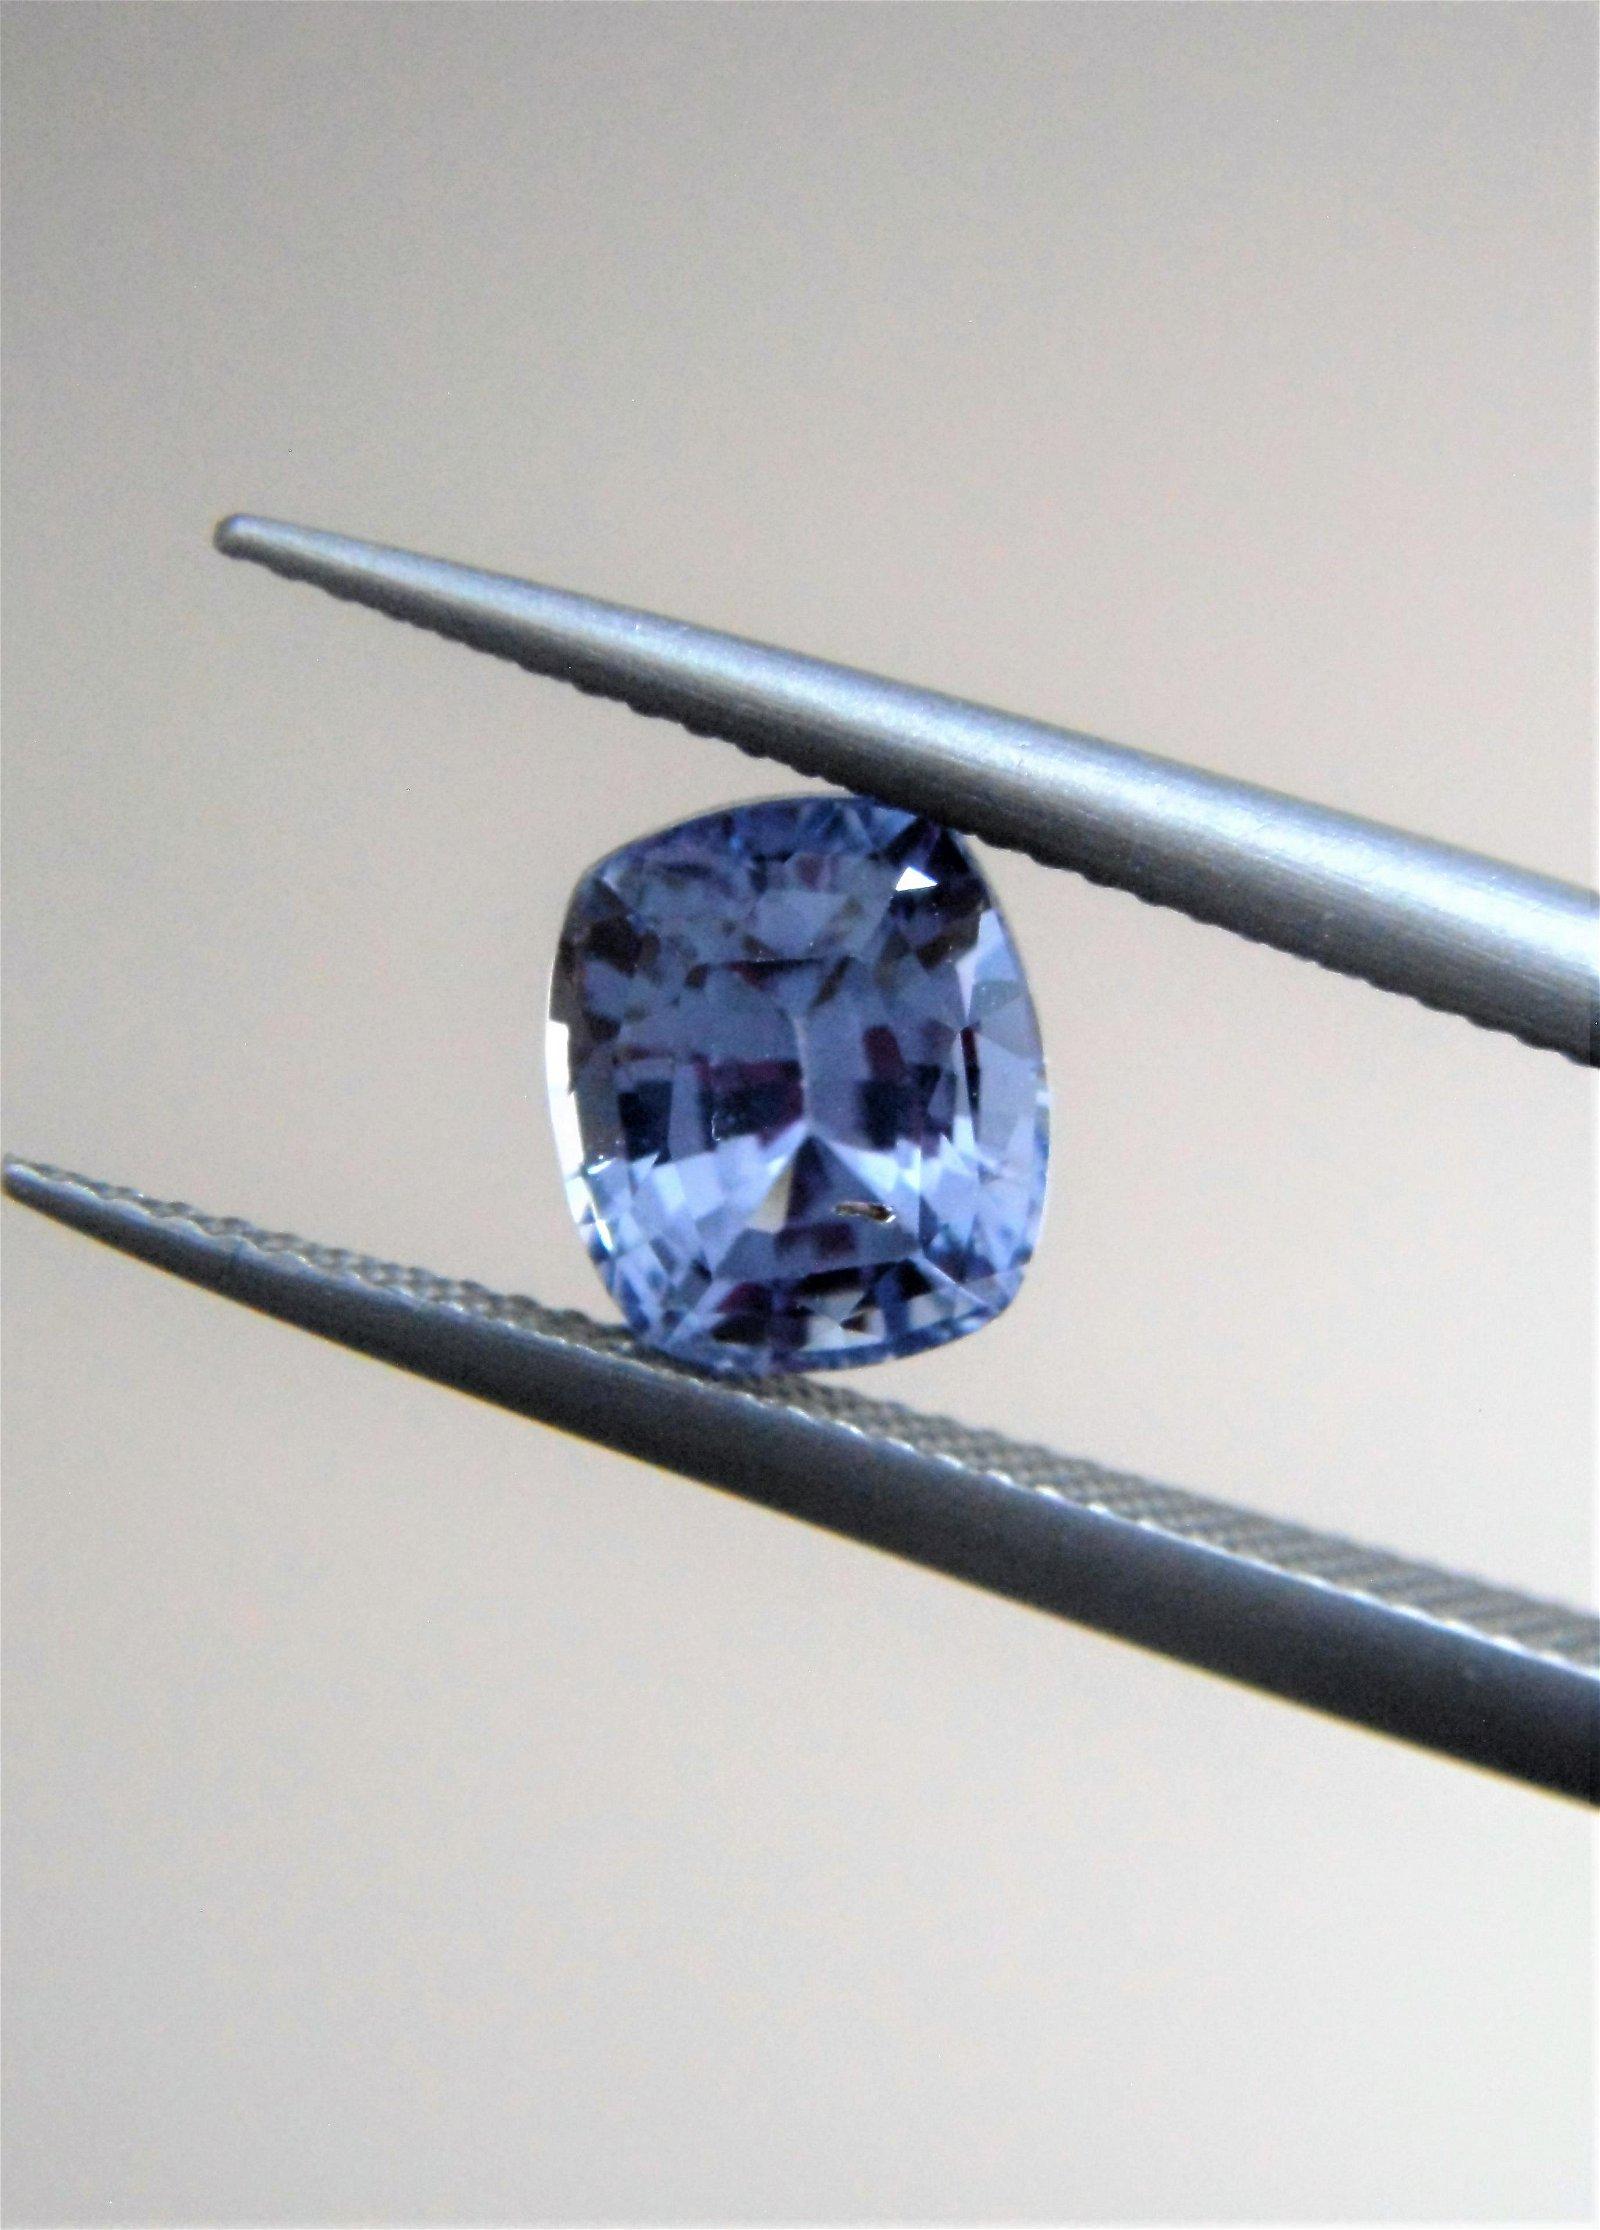 Blue Sapphire No Heat Certified - 1.11 ct